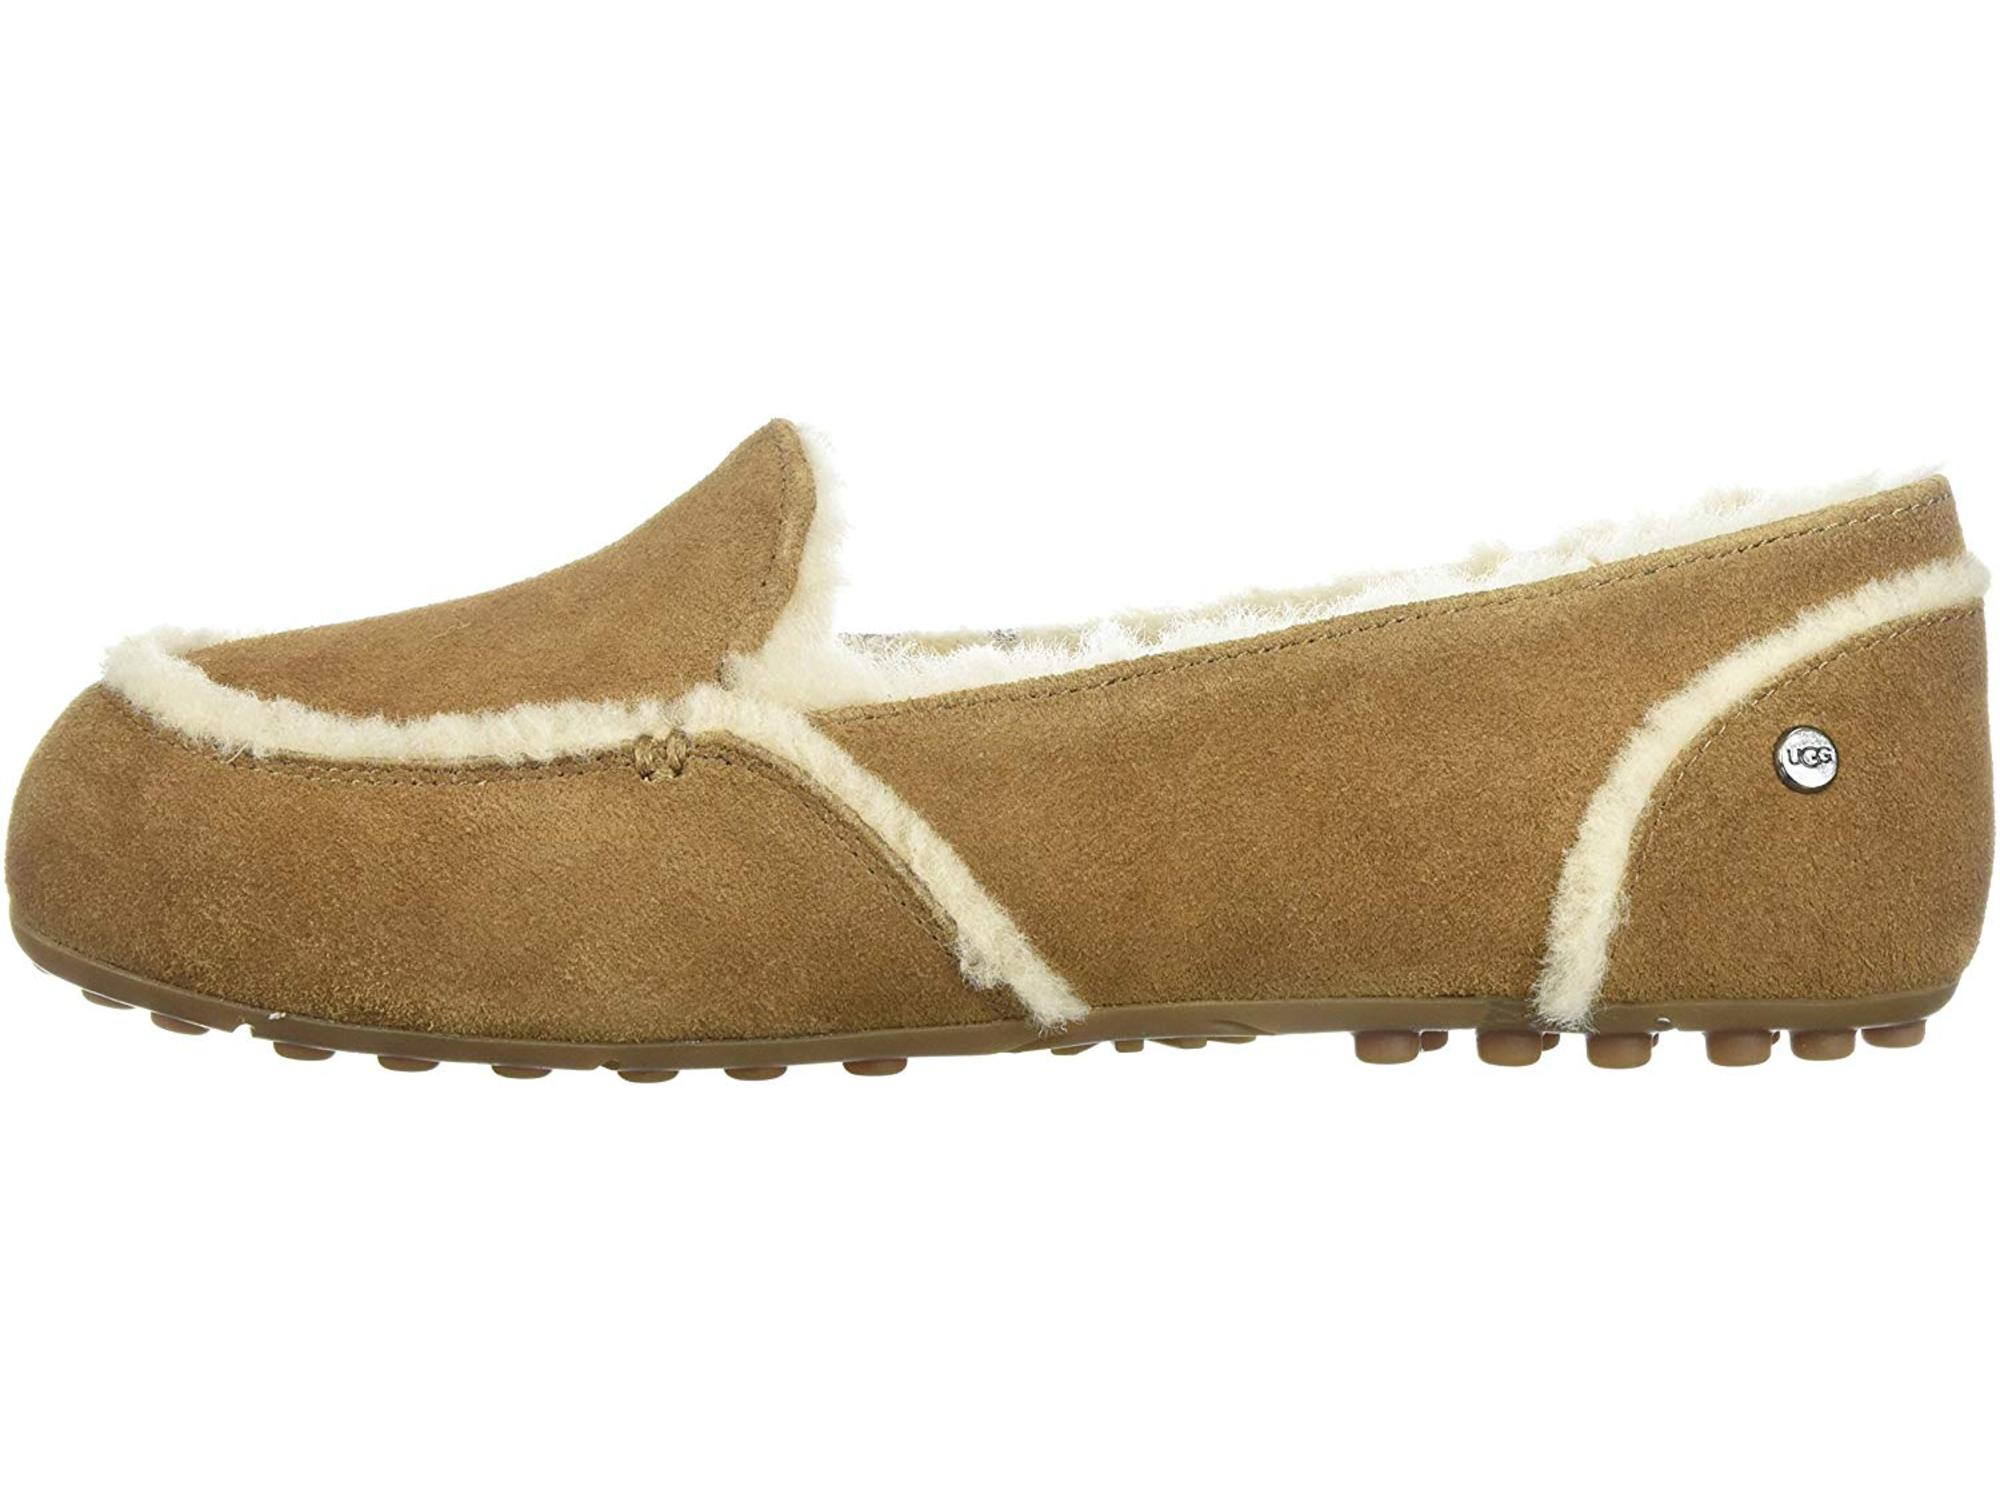 UGG Hailey Moccasin Slipper